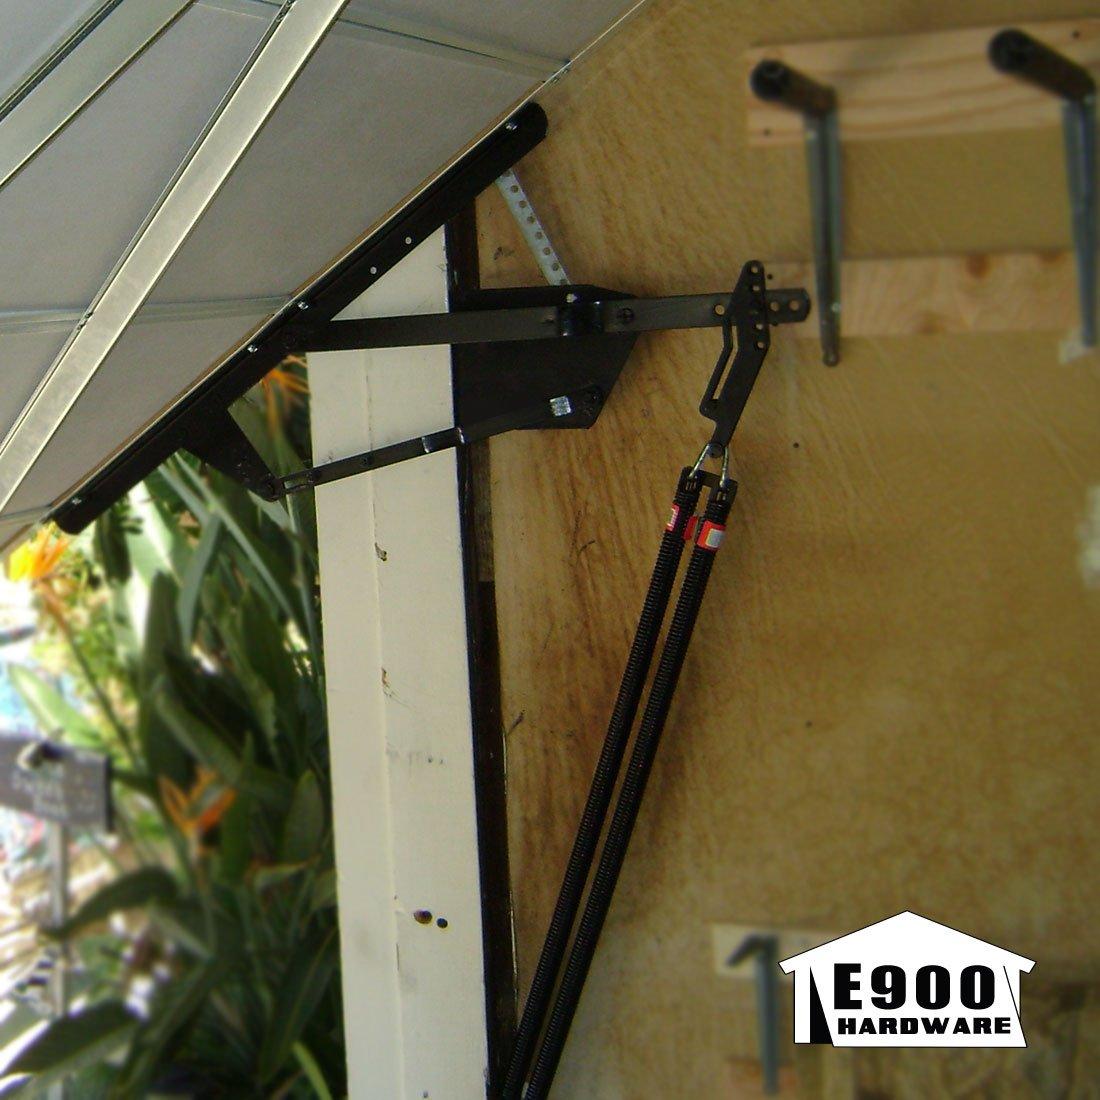 E900 Hardware Universal One Piece Garage Door Hardware Kit